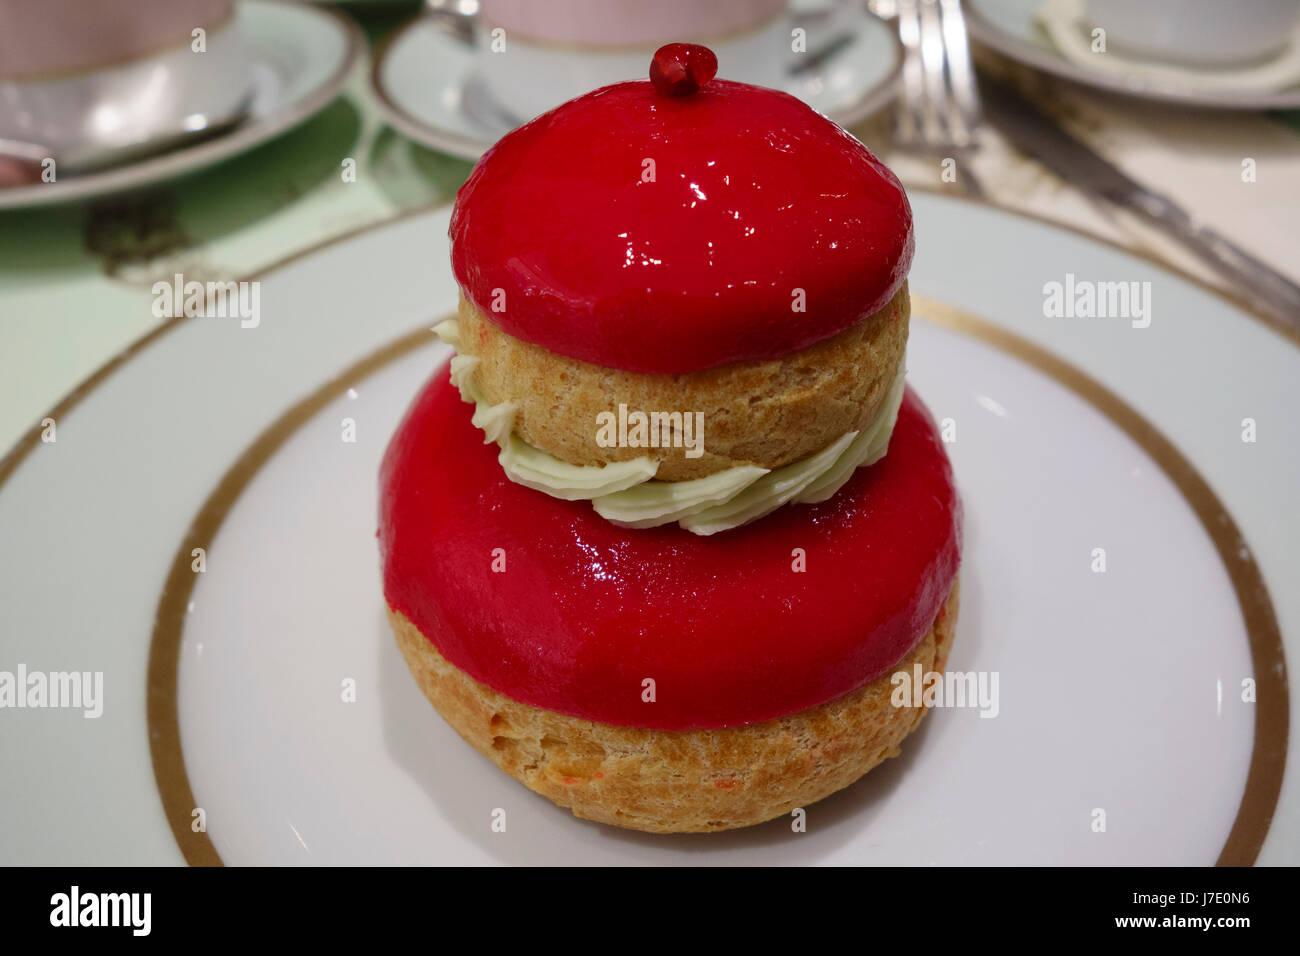 Strawberry religeuse at Laduree, Paris, France - Stock Image